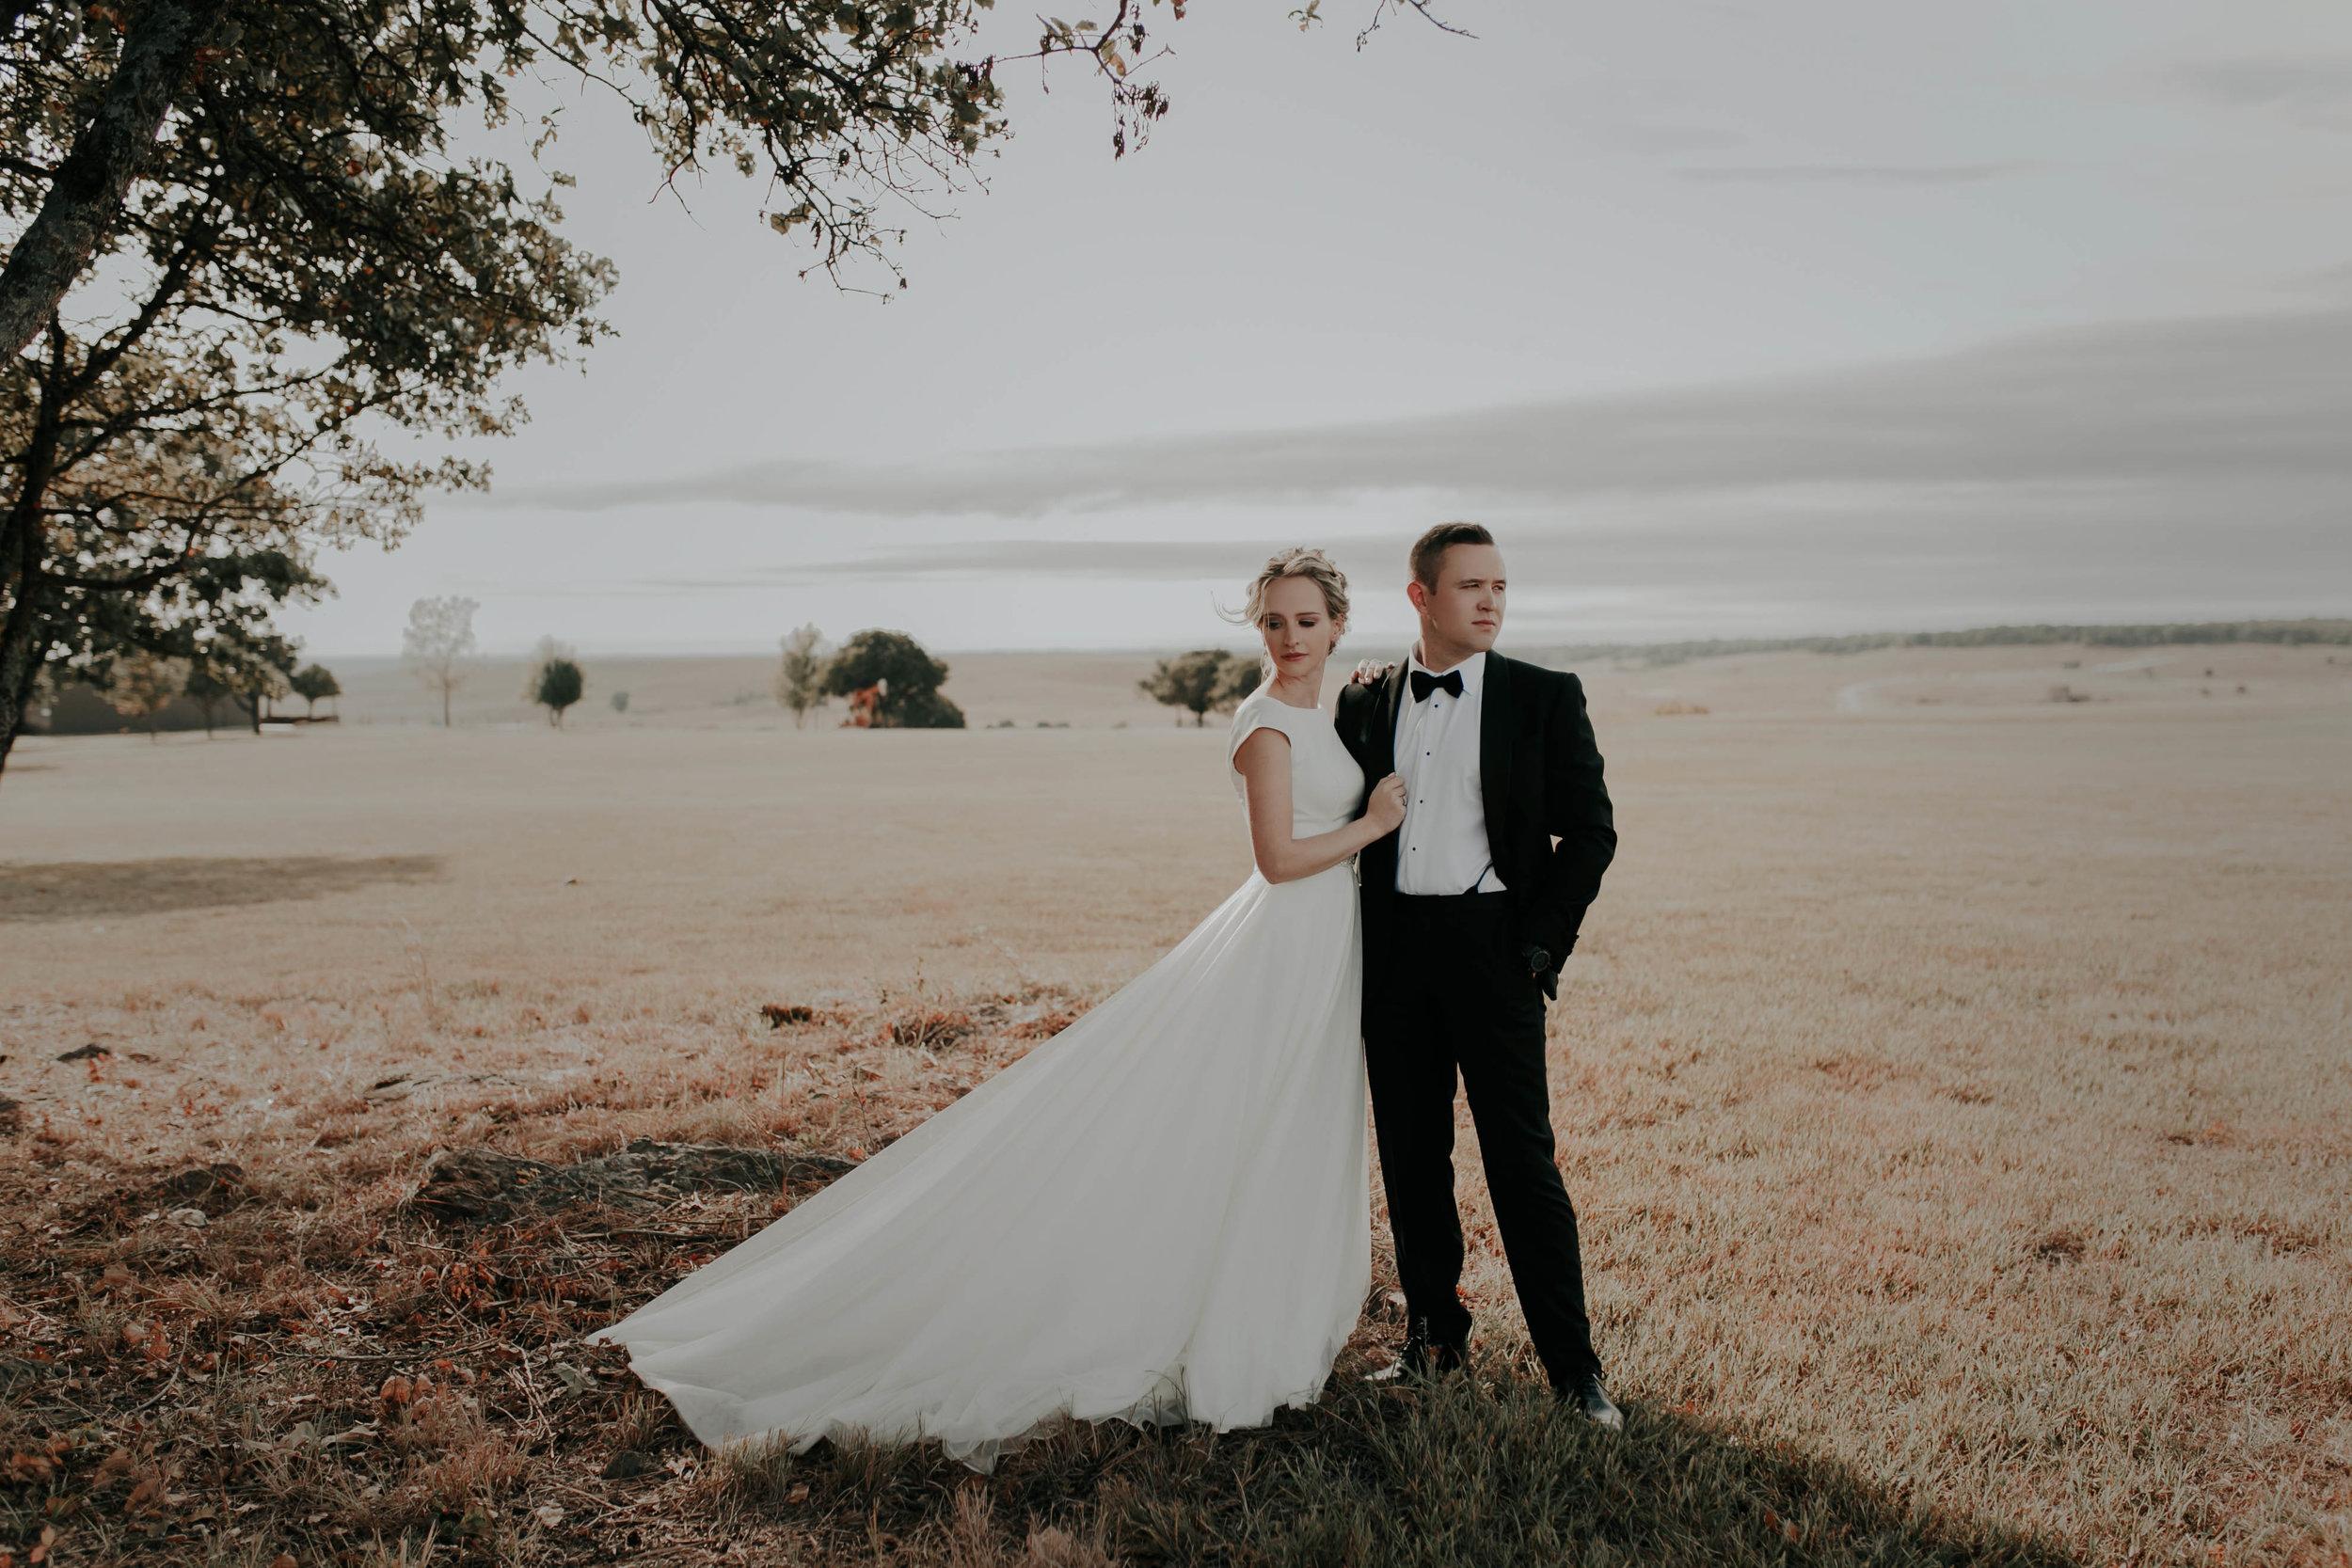 10.06.18ClayEmilyWedding-BrideGroom--17.jpg